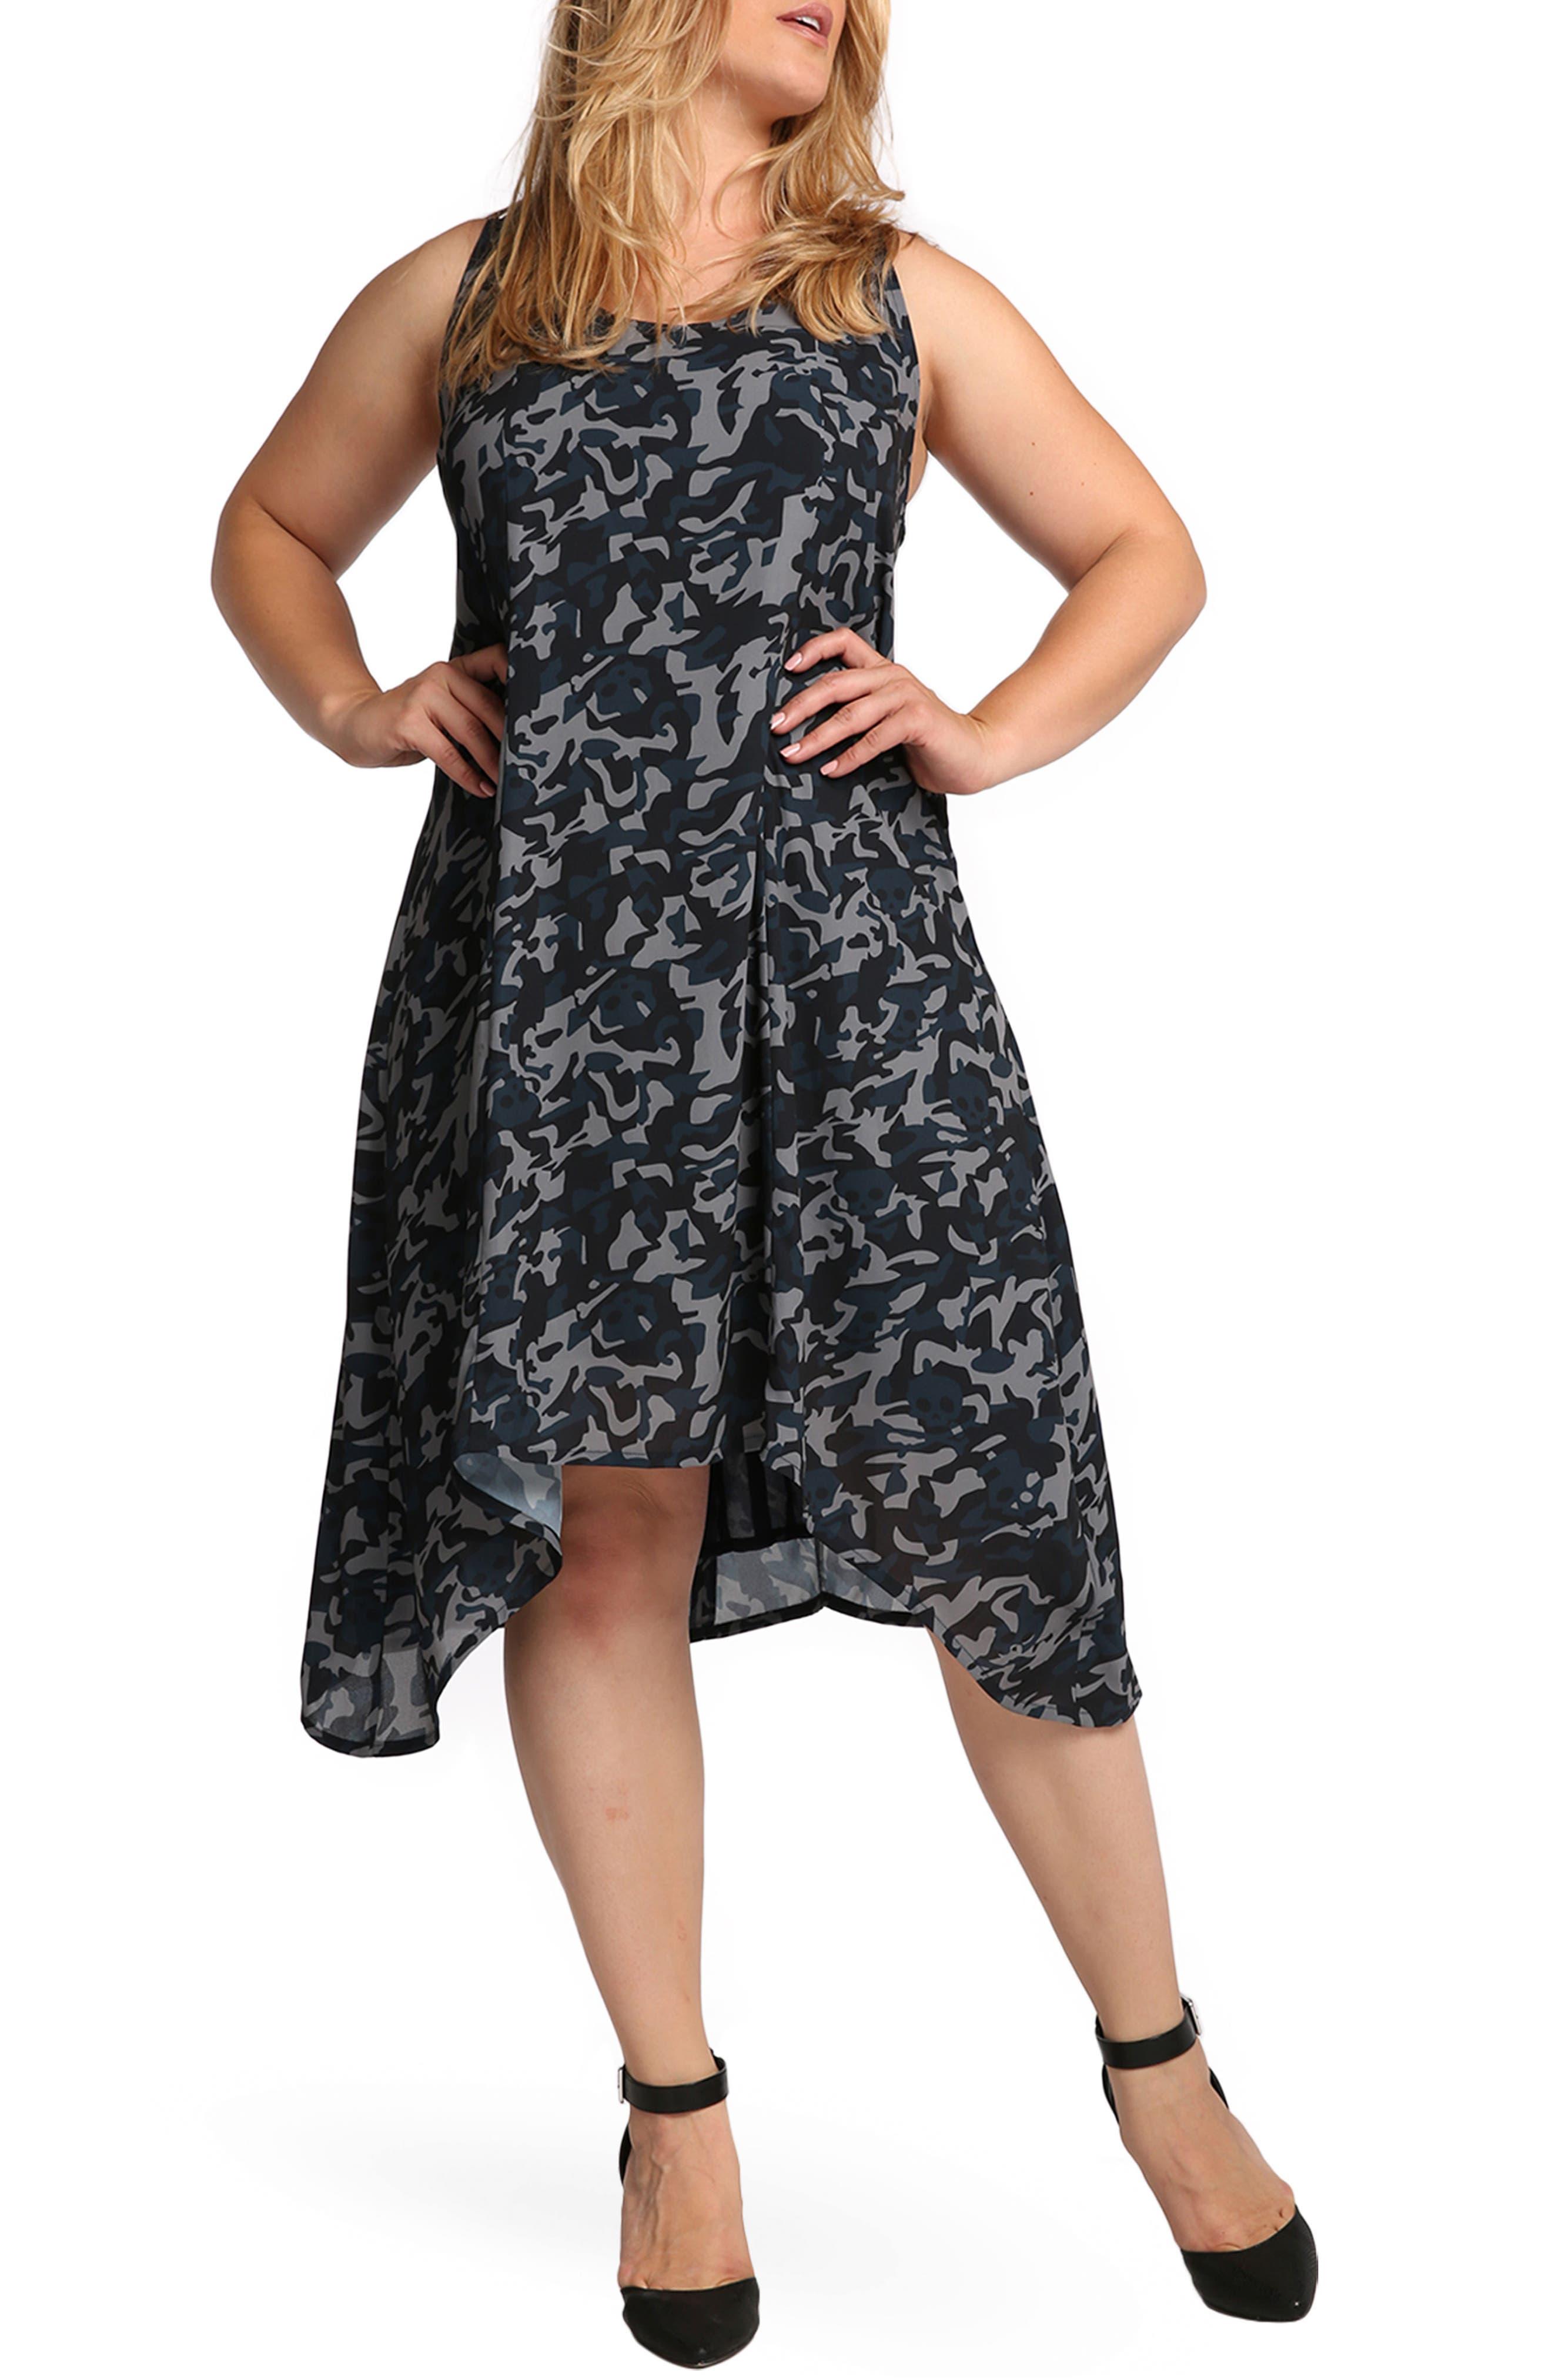 Ace Camo Print Tank Dress,                             Main thumbnail 1, color,